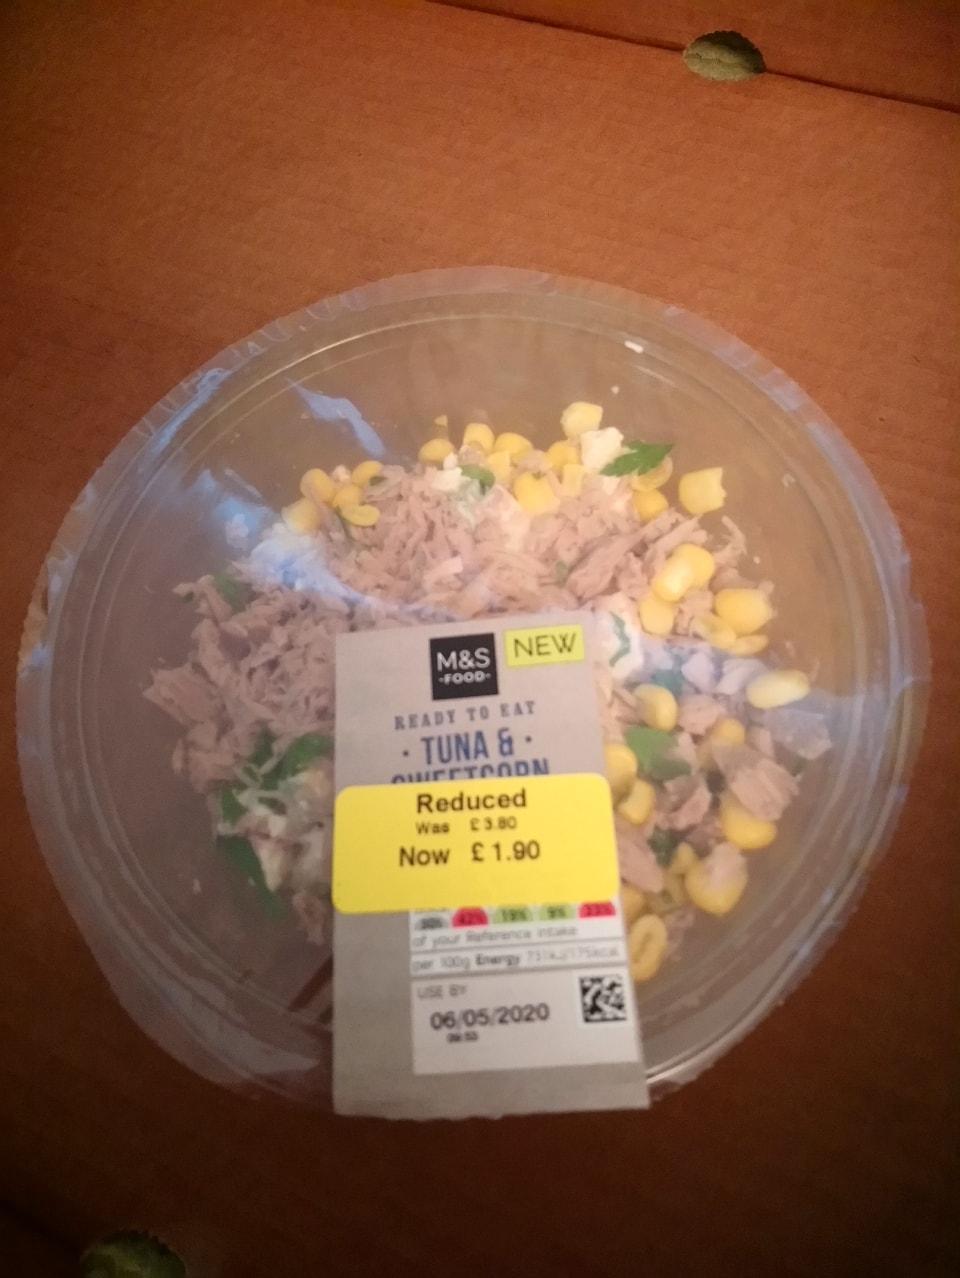 Tuna and sweetcorn pasta salad